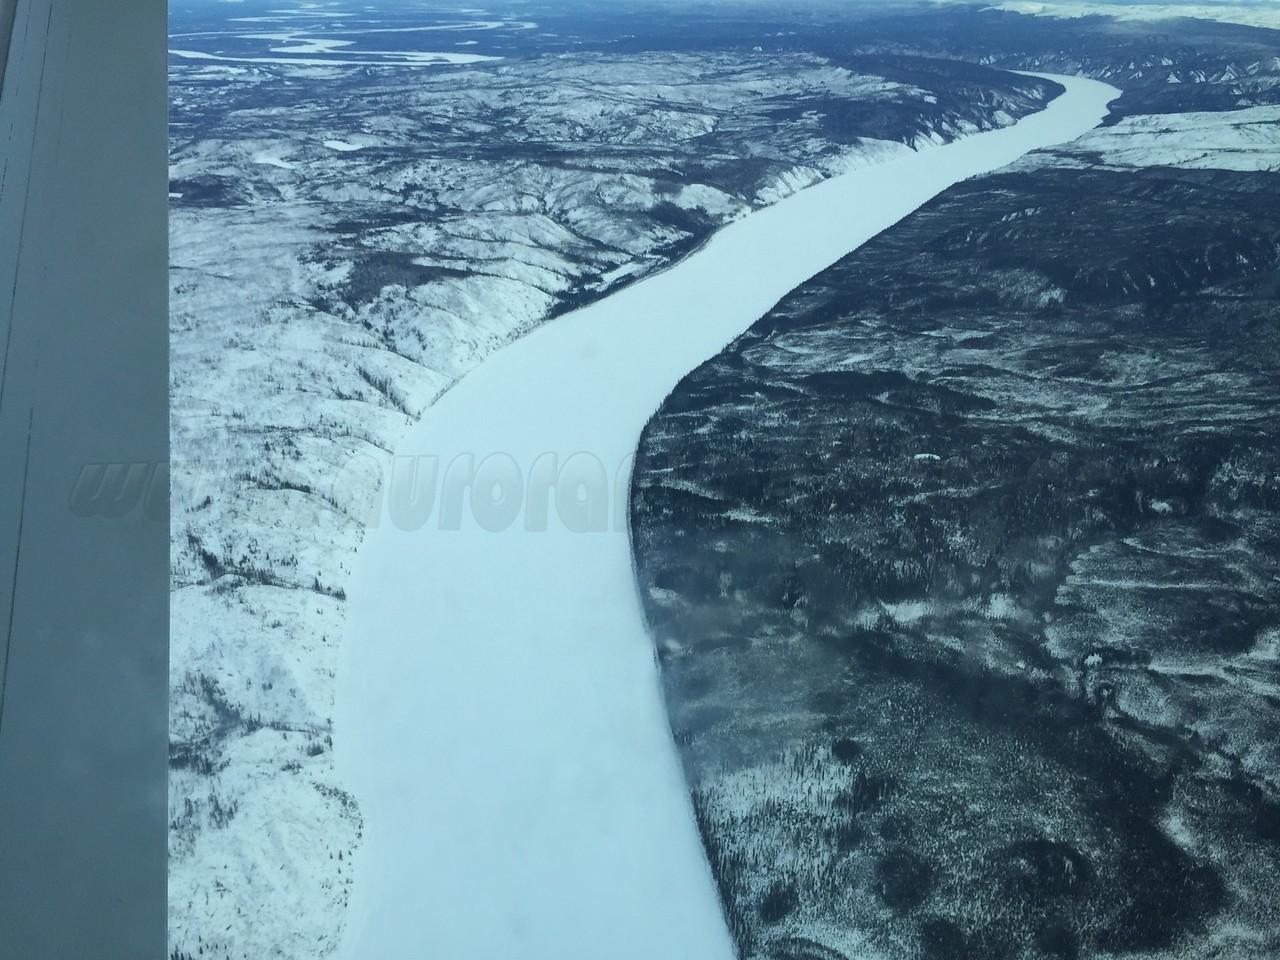 Flying above the Yukon River